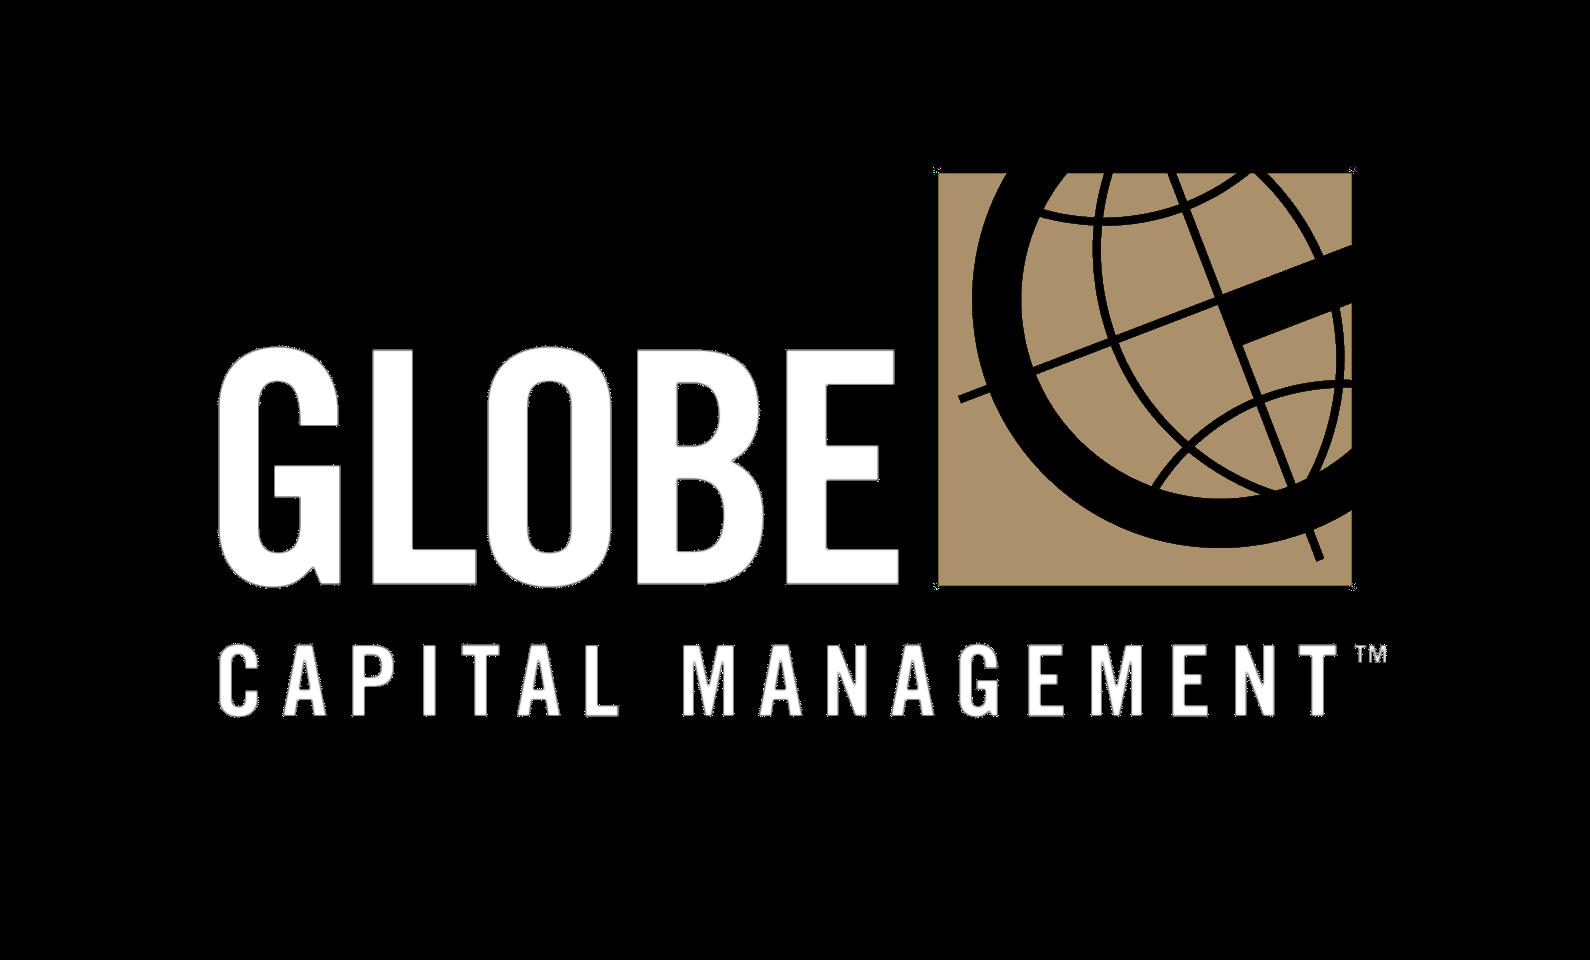 Globe Capital Management